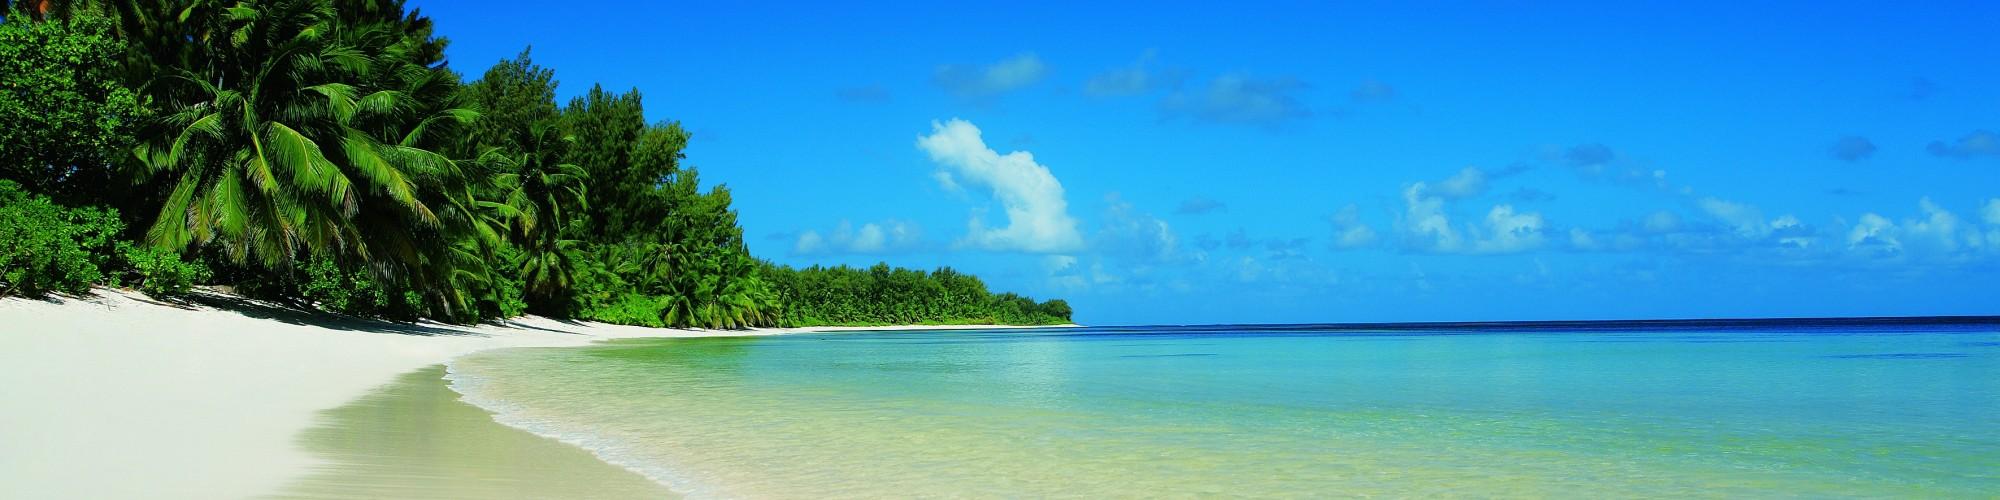 Desroches, Seychelles